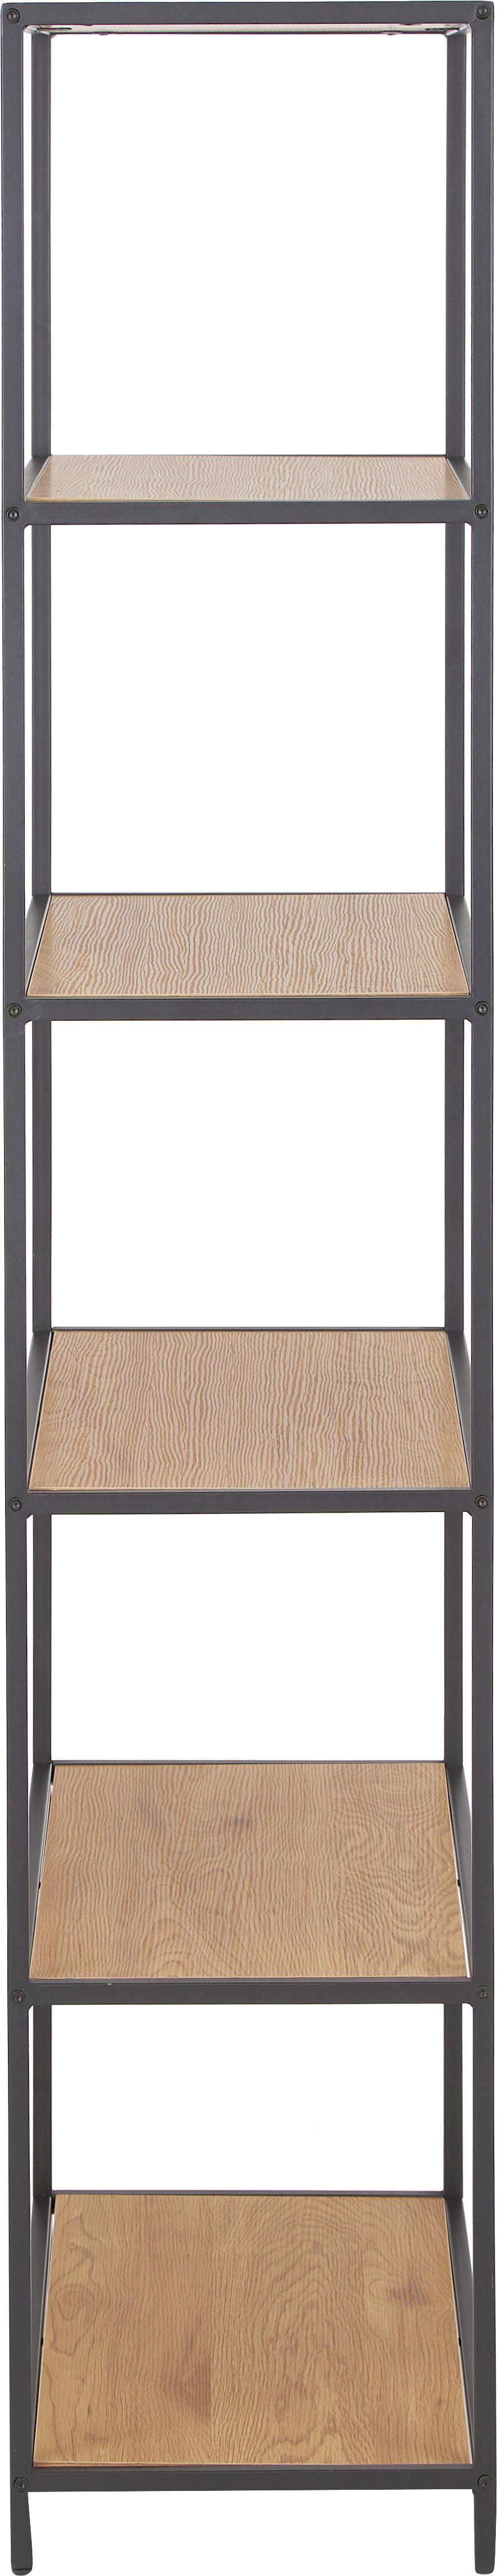 Estantería alta Seaford, Estantes: tablero de fibras de dens, Estructura: metal, pintura en polvo, Estantes: roble Estructura: negro, An 77 x Al 185 cm